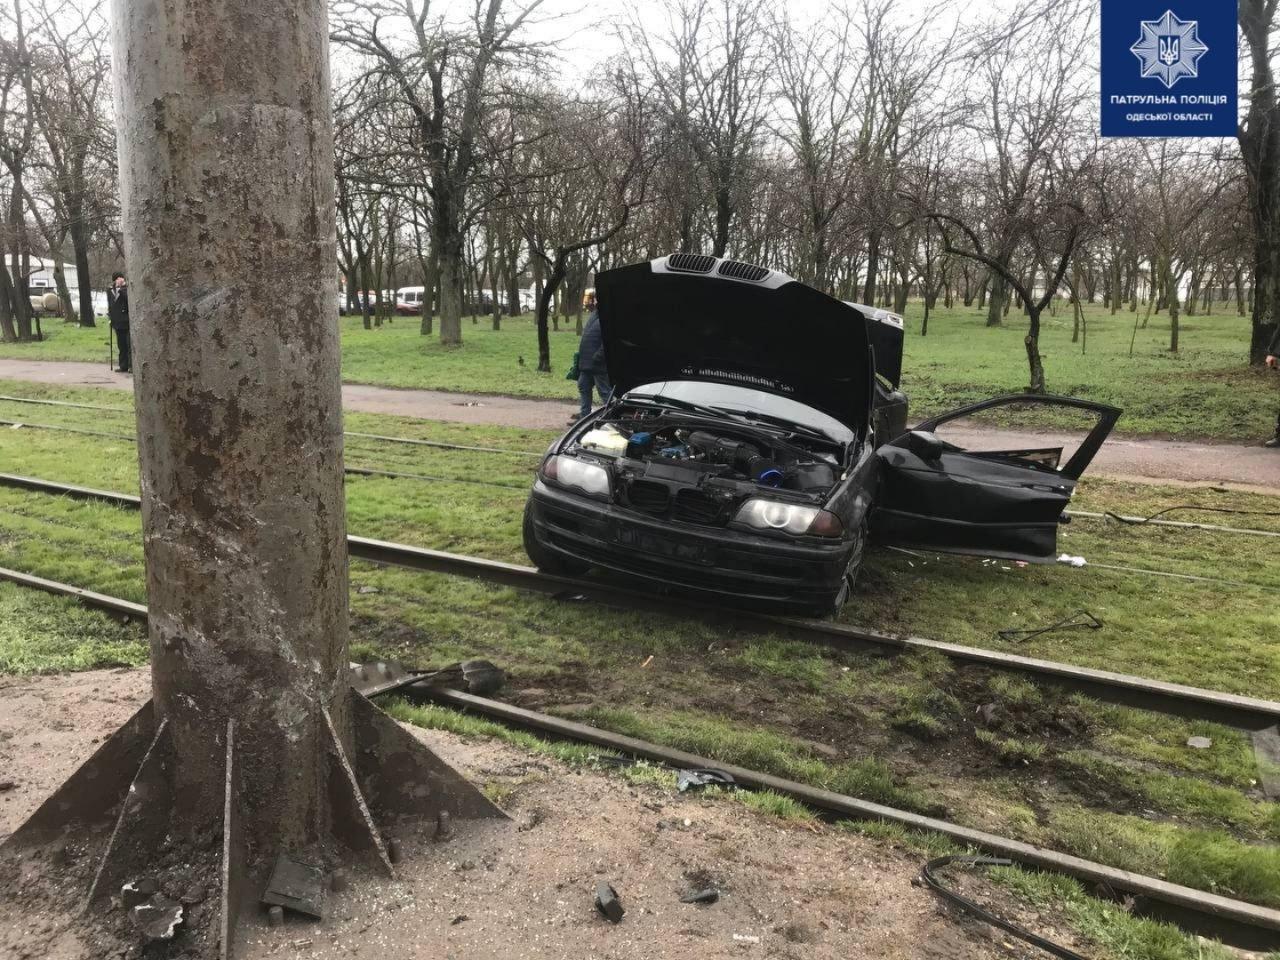 В Одессе на поселке машина влетела в столб , - ФОТО, фото-2